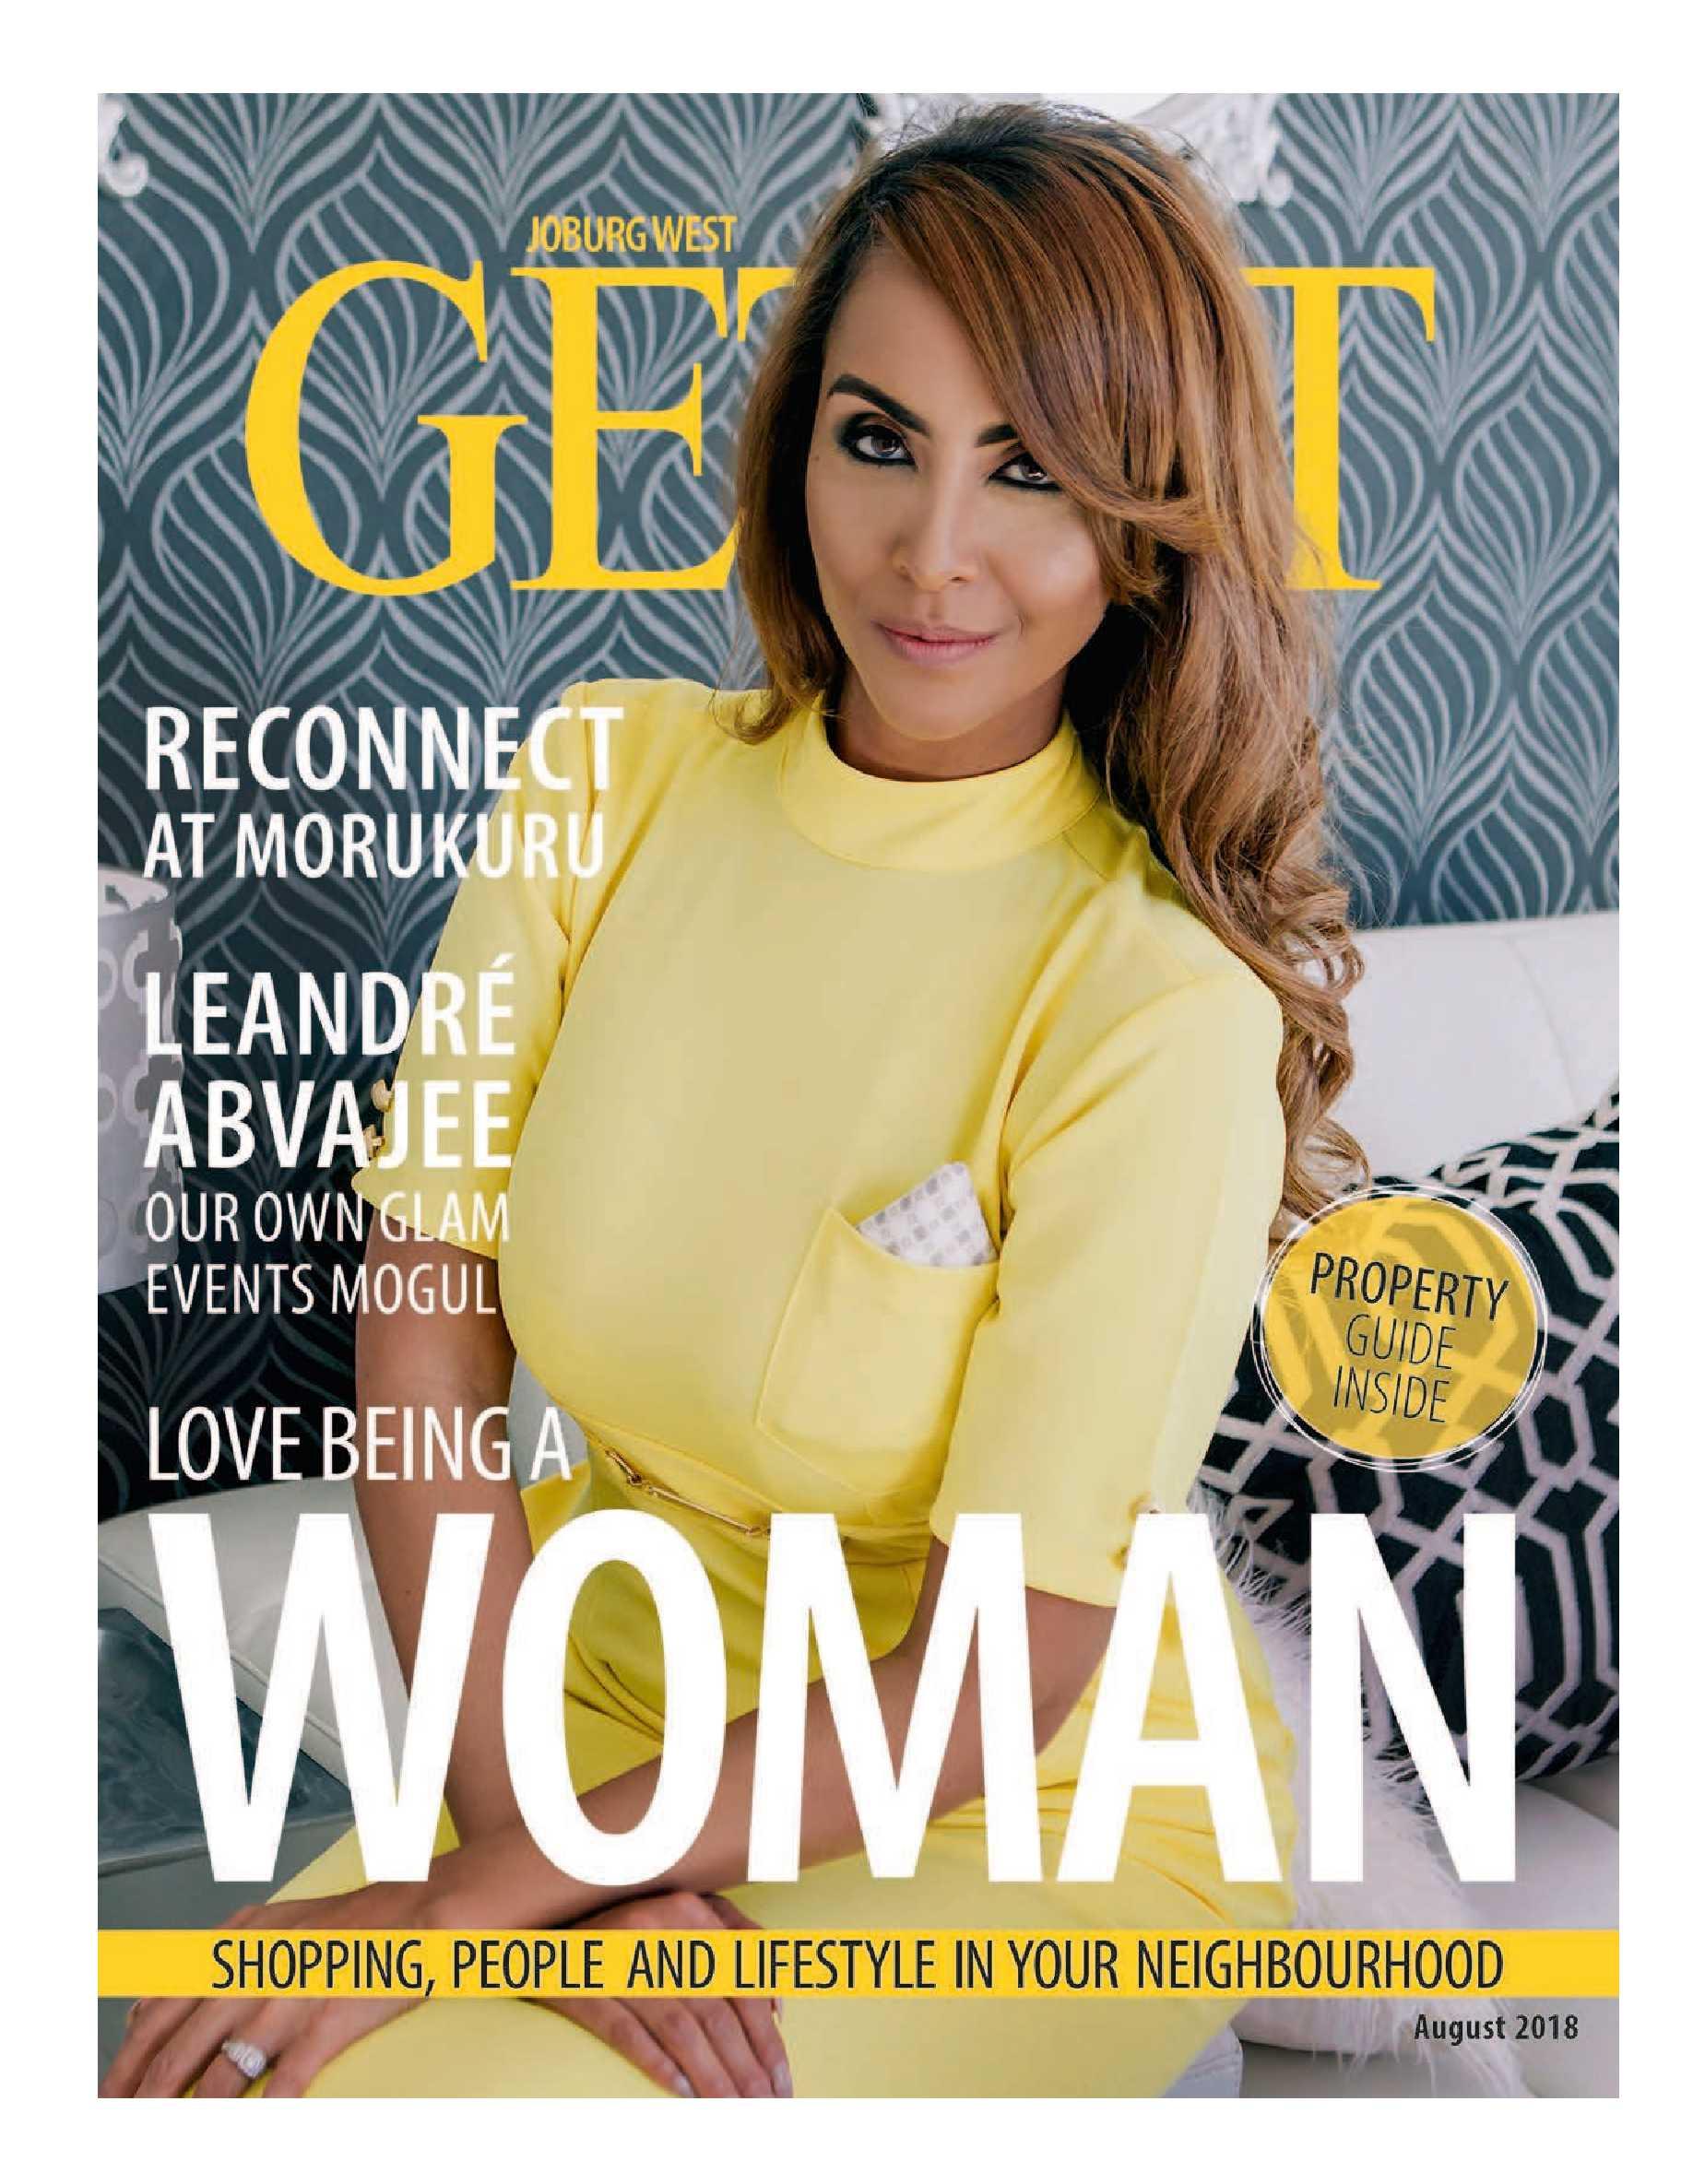 getit-joburg-west-august-2018-epapers-page-1